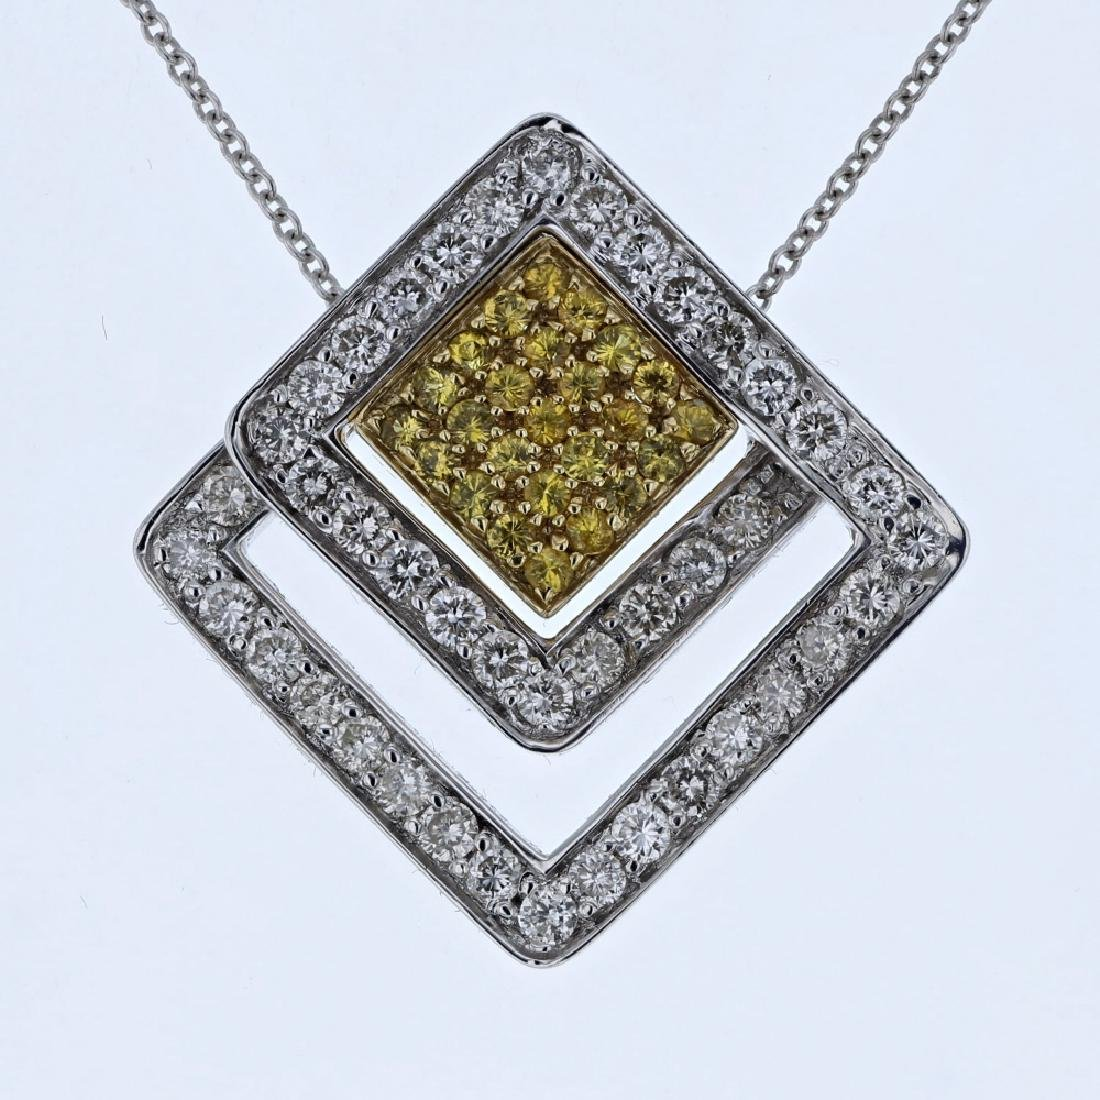 14K TwoTone Gold 1.41CTW Diamond&Sapphire Pendant